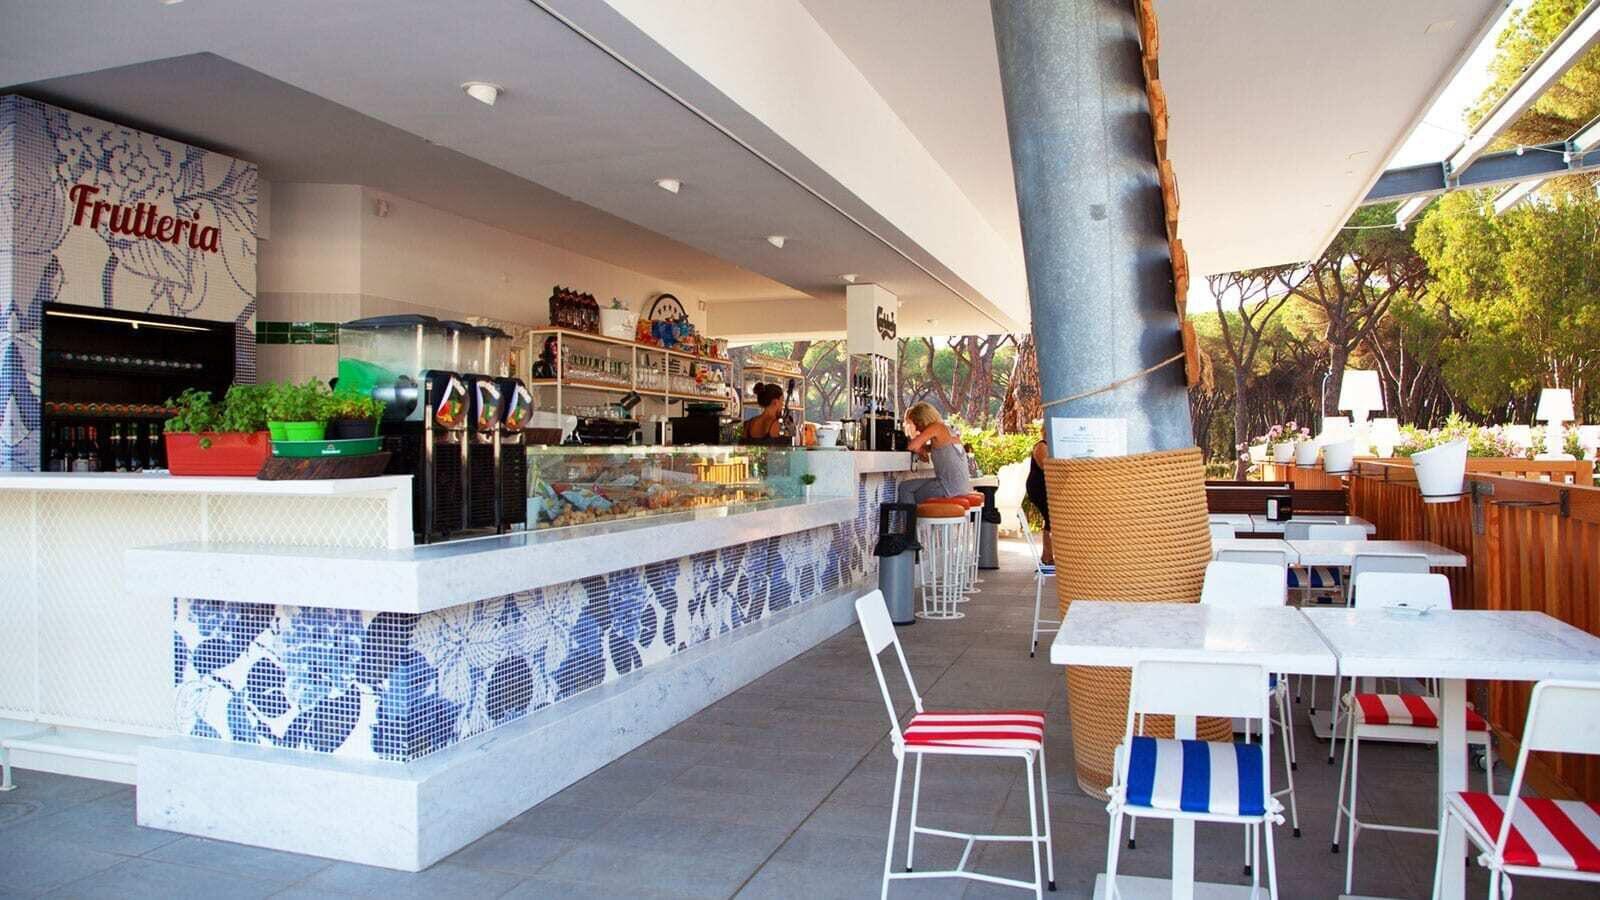 BACCANO, Rom Centro Menü, Preise & Restaurant